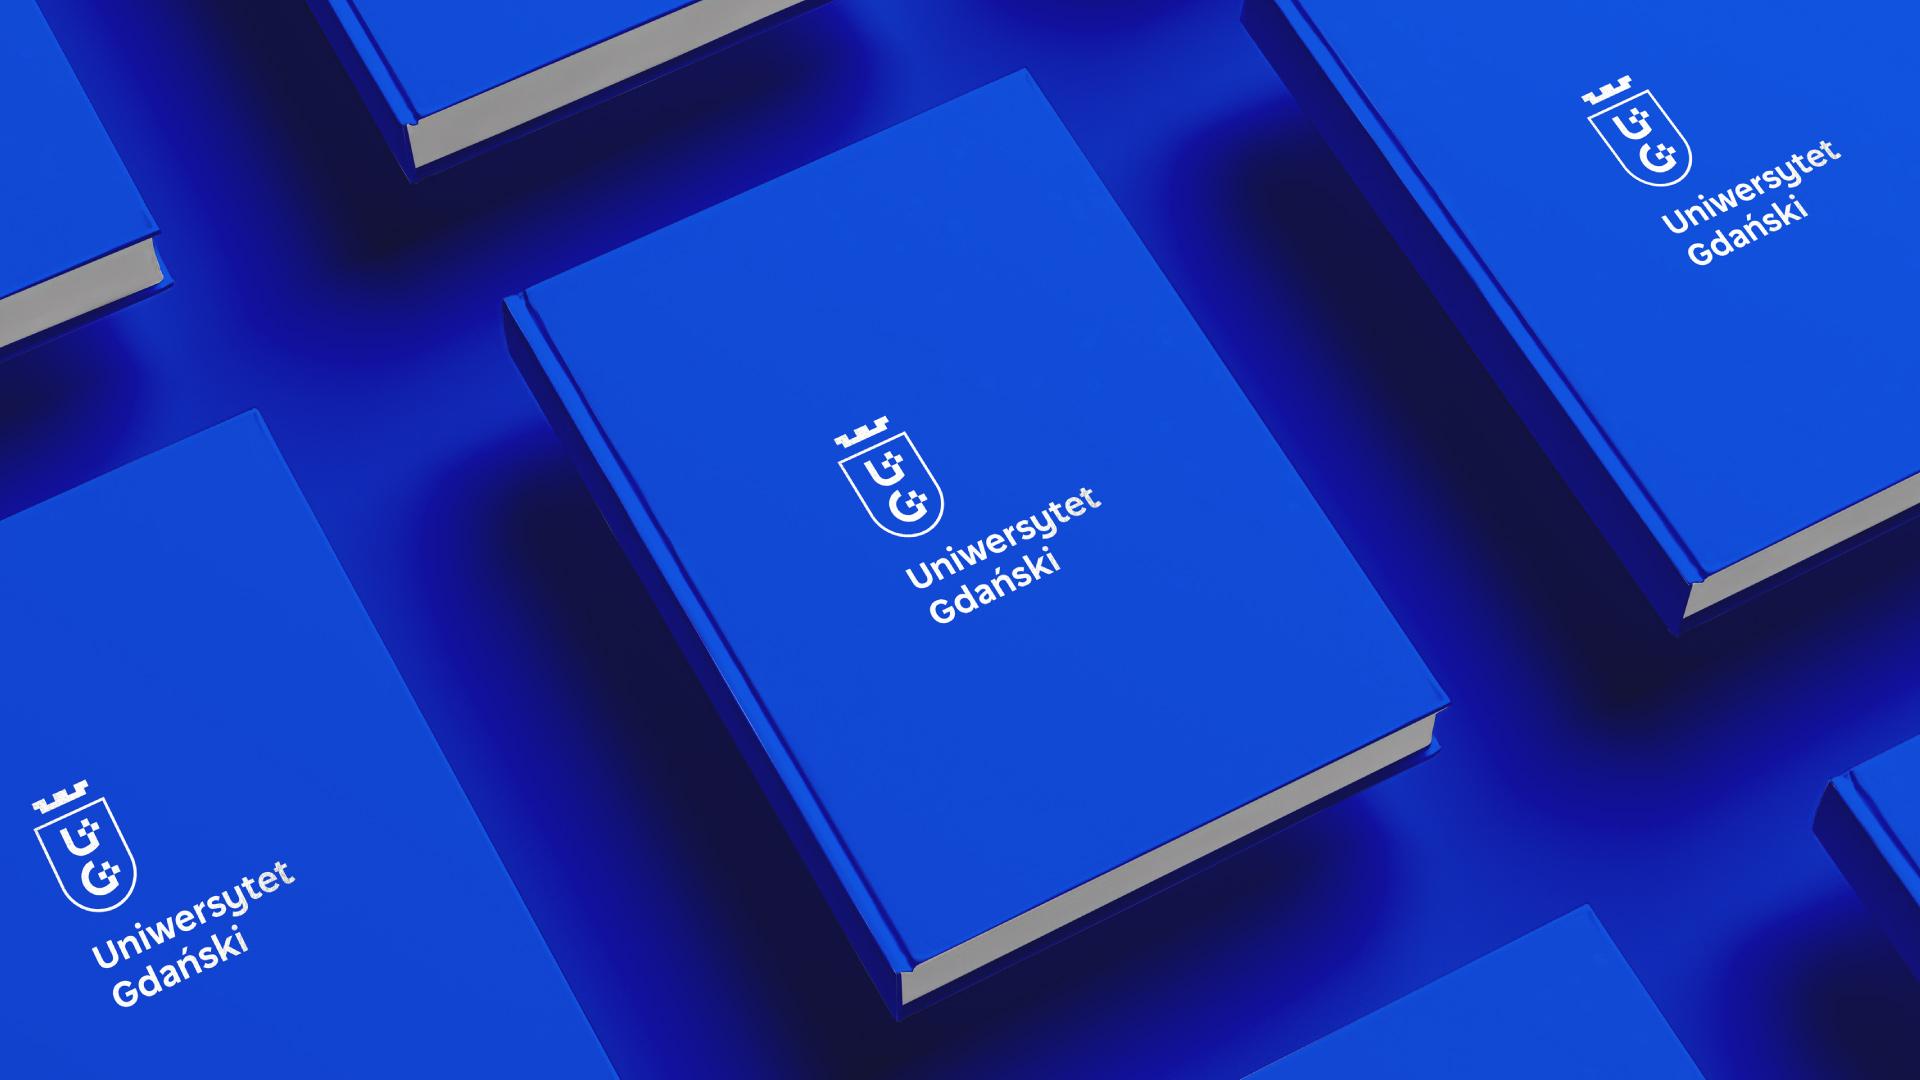 projekt nowe logo UG branding identyfikacja studio graficzne Spectro